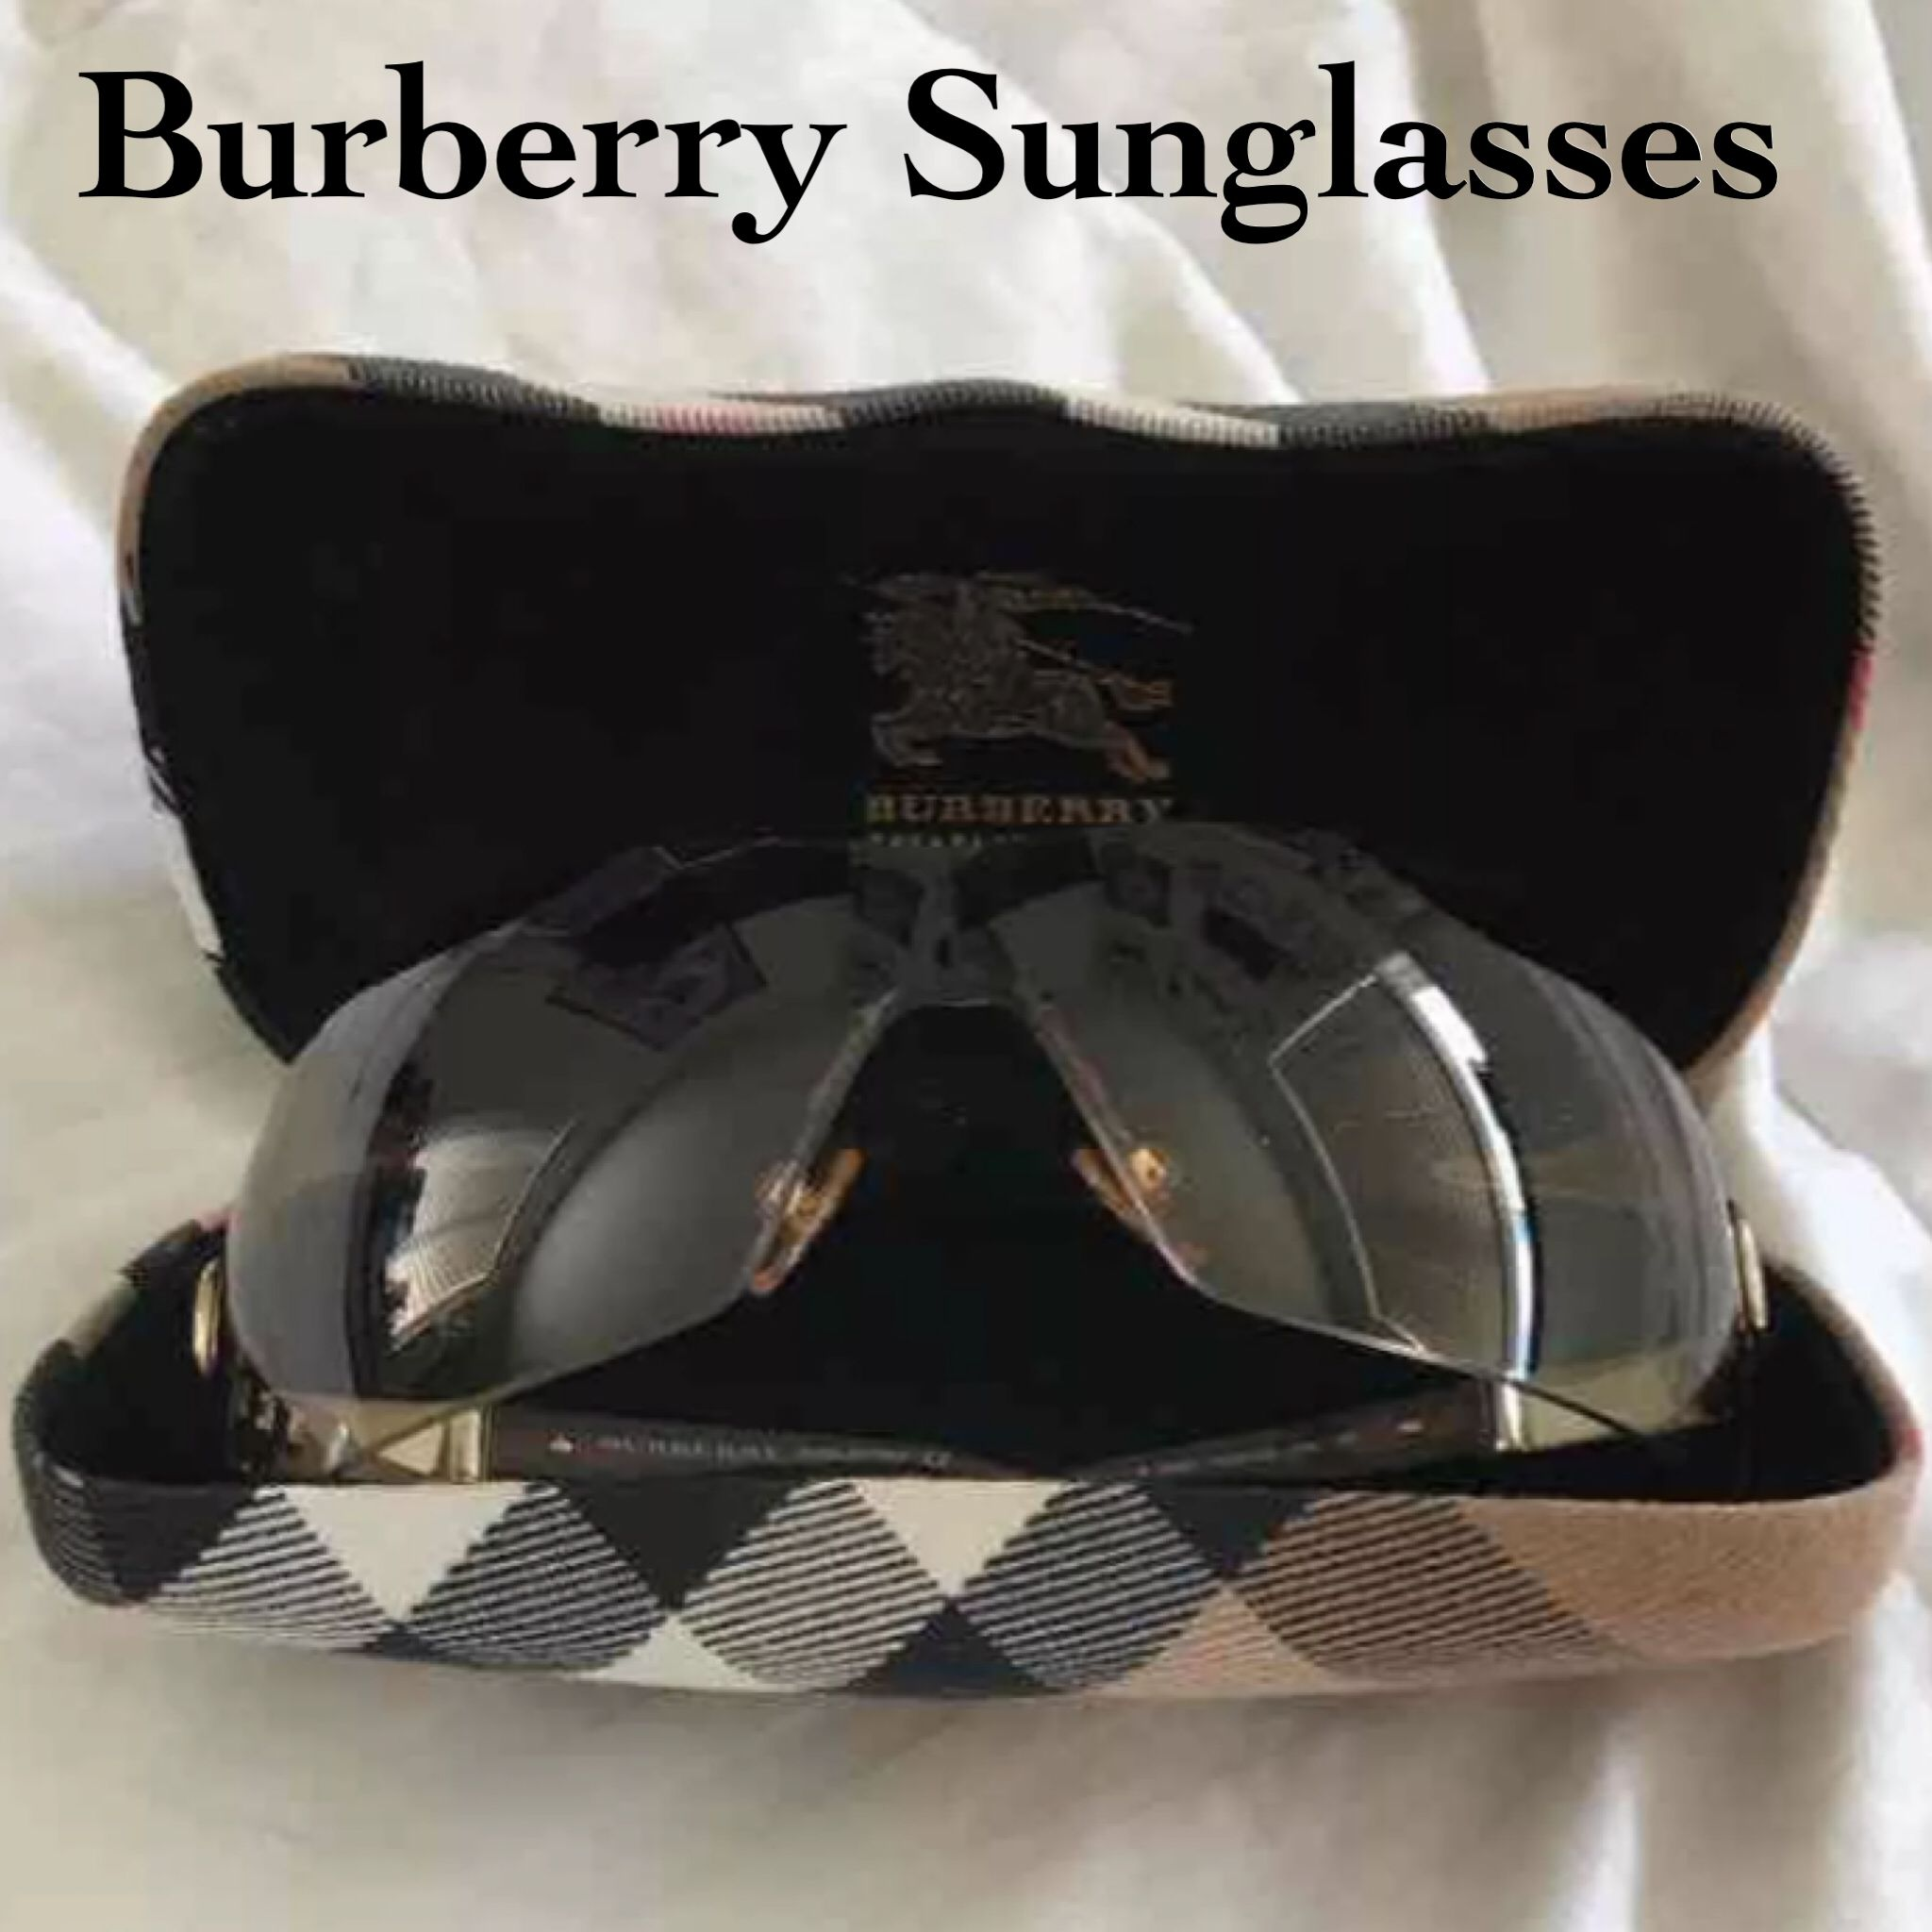 burberry 3043 sunglasses